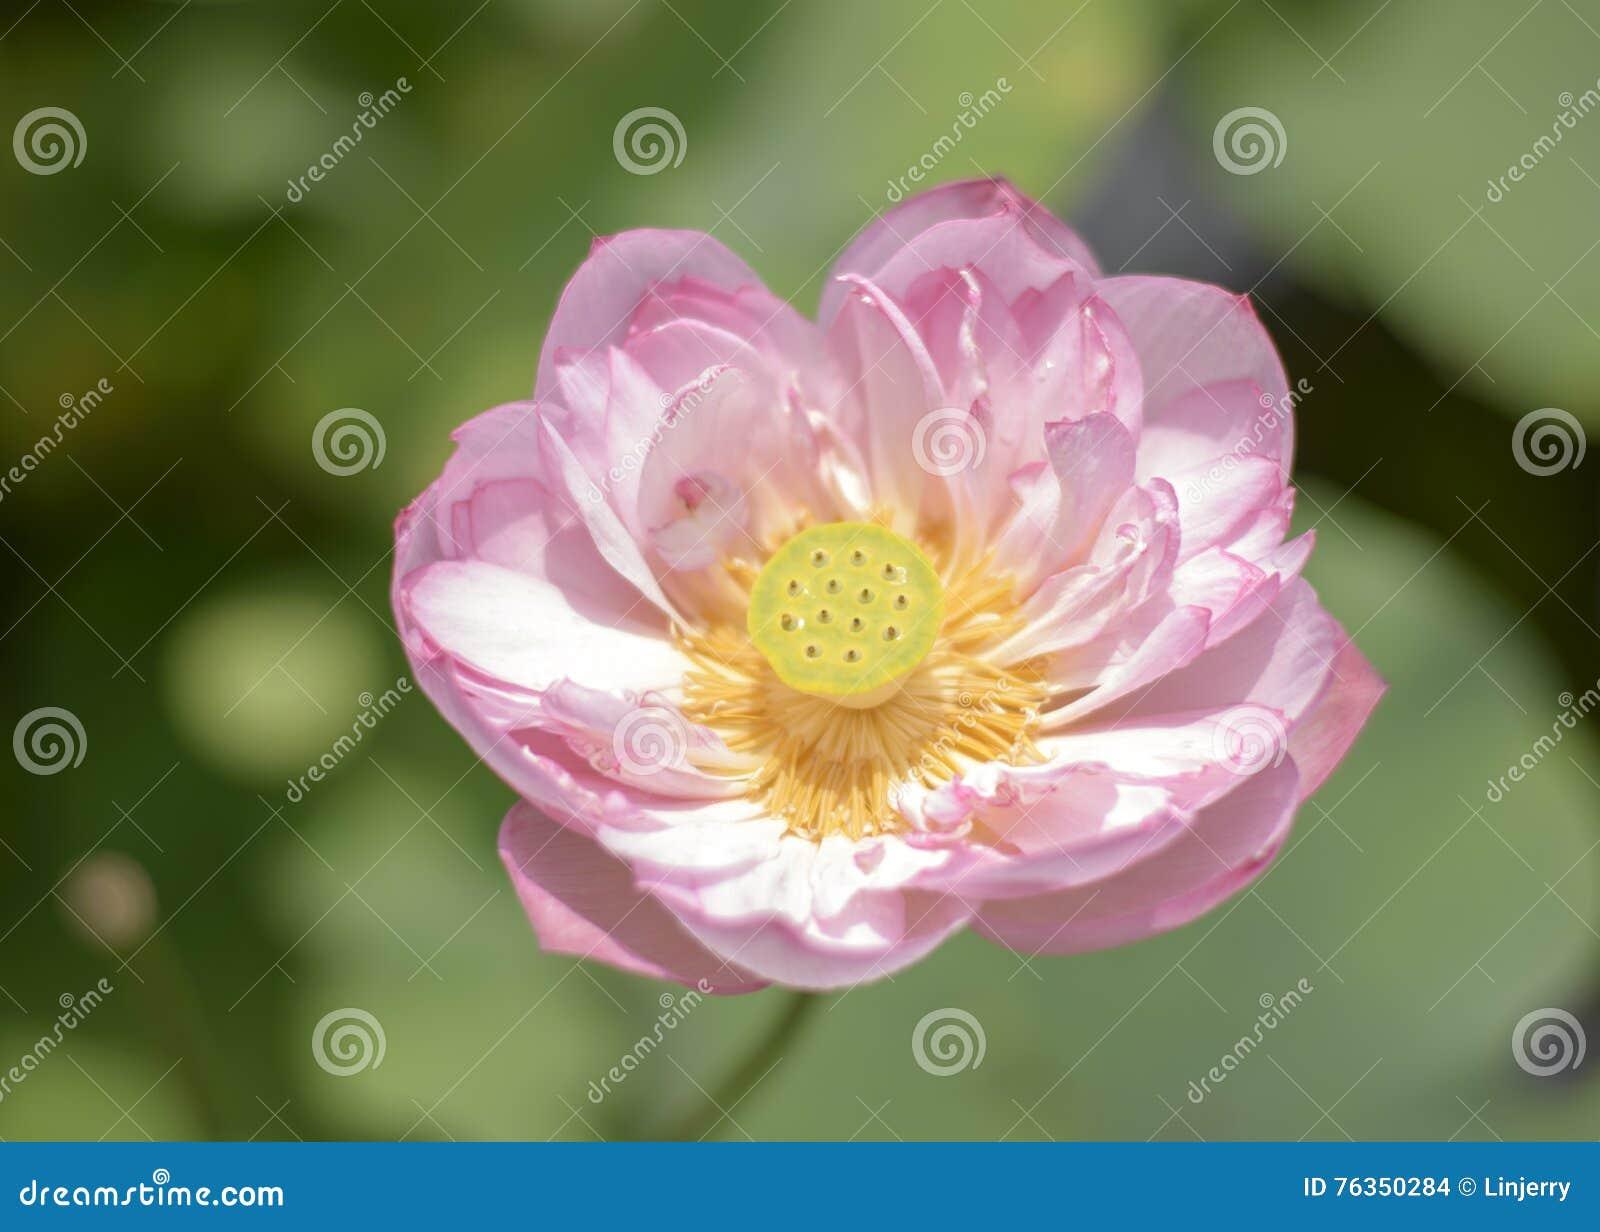 Bloom lotus flower wallpaper stock photo image of blooming bloom lotus flower wallpaper izmirmasajfo